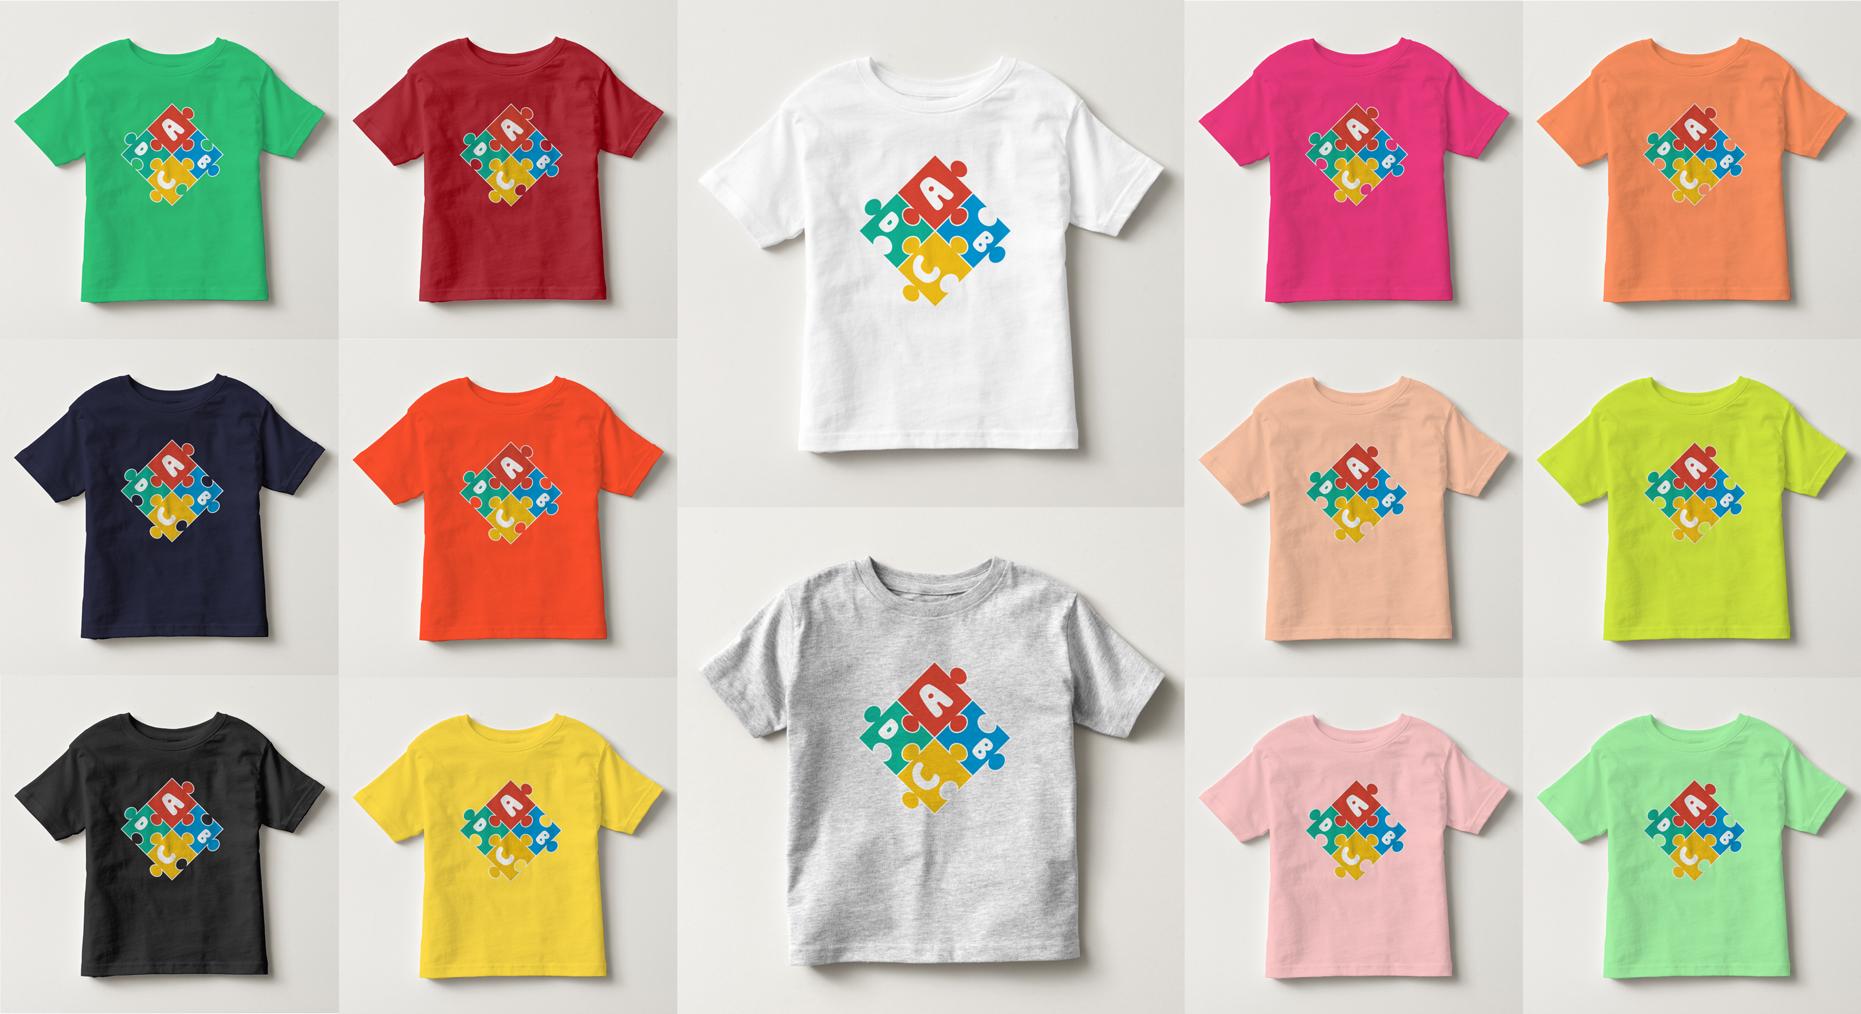 áo thun trẻ em in chữ cái abcd